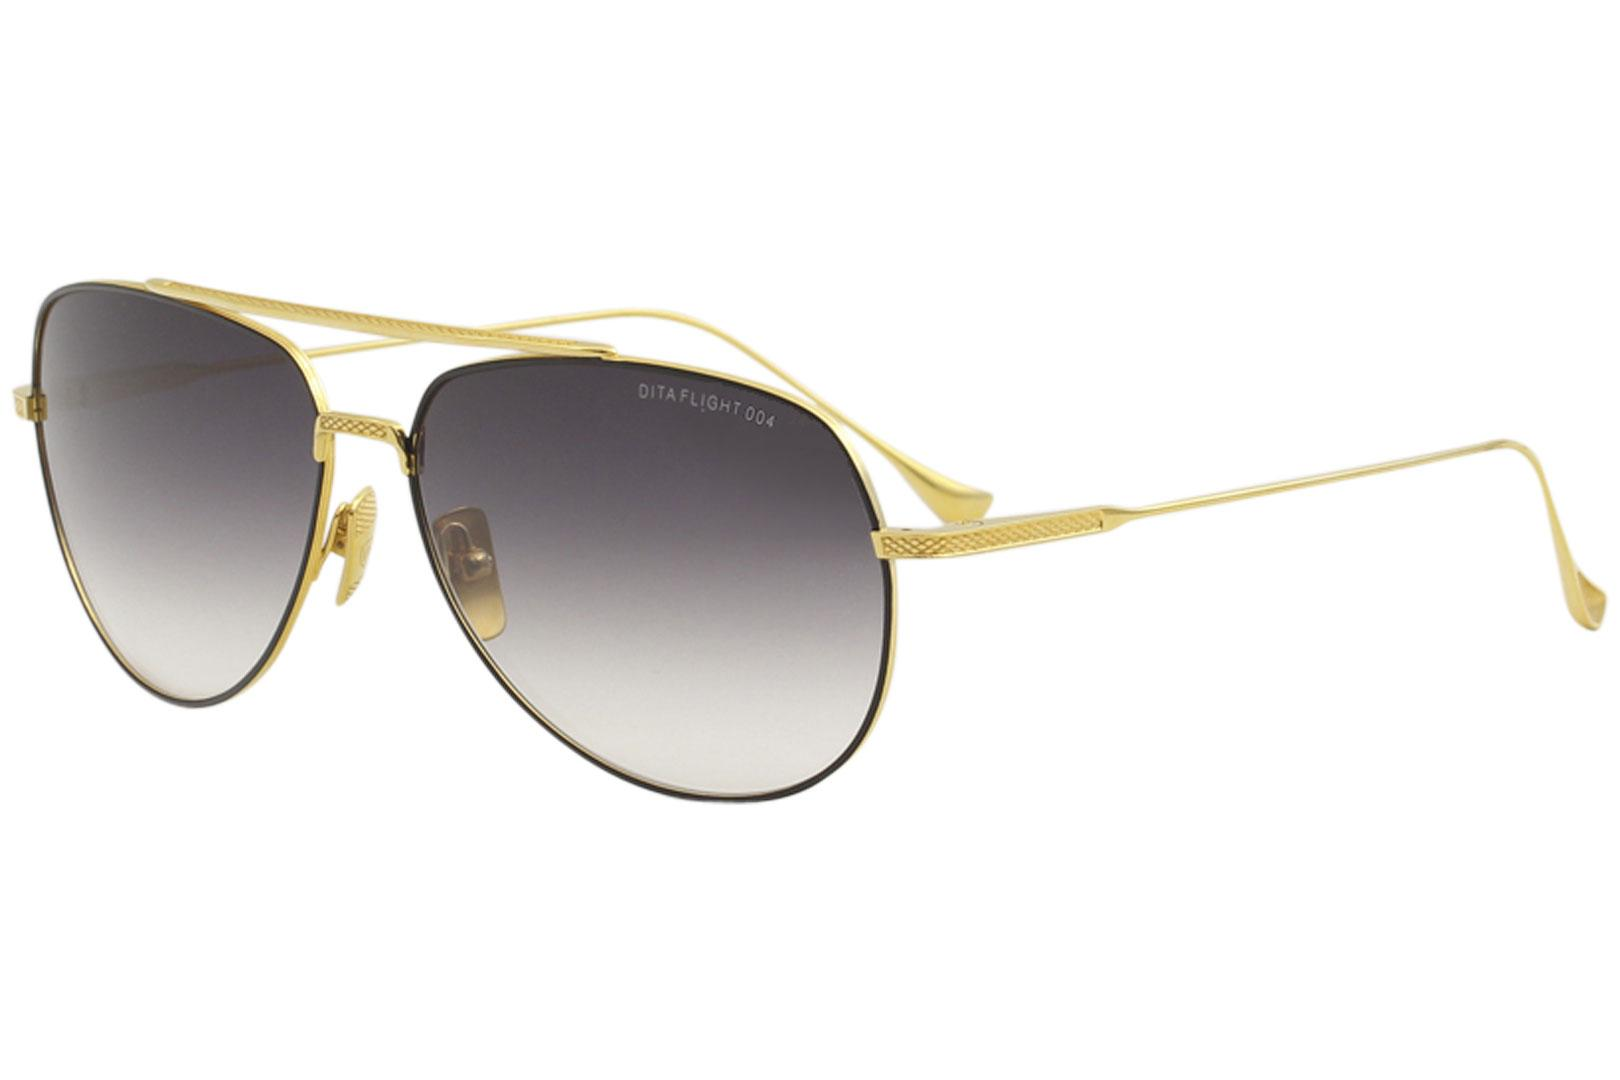 6856428ac44e Dita Men s Flight-004 7804 18K Gold Fashion Pilot Titanium Sunglasses